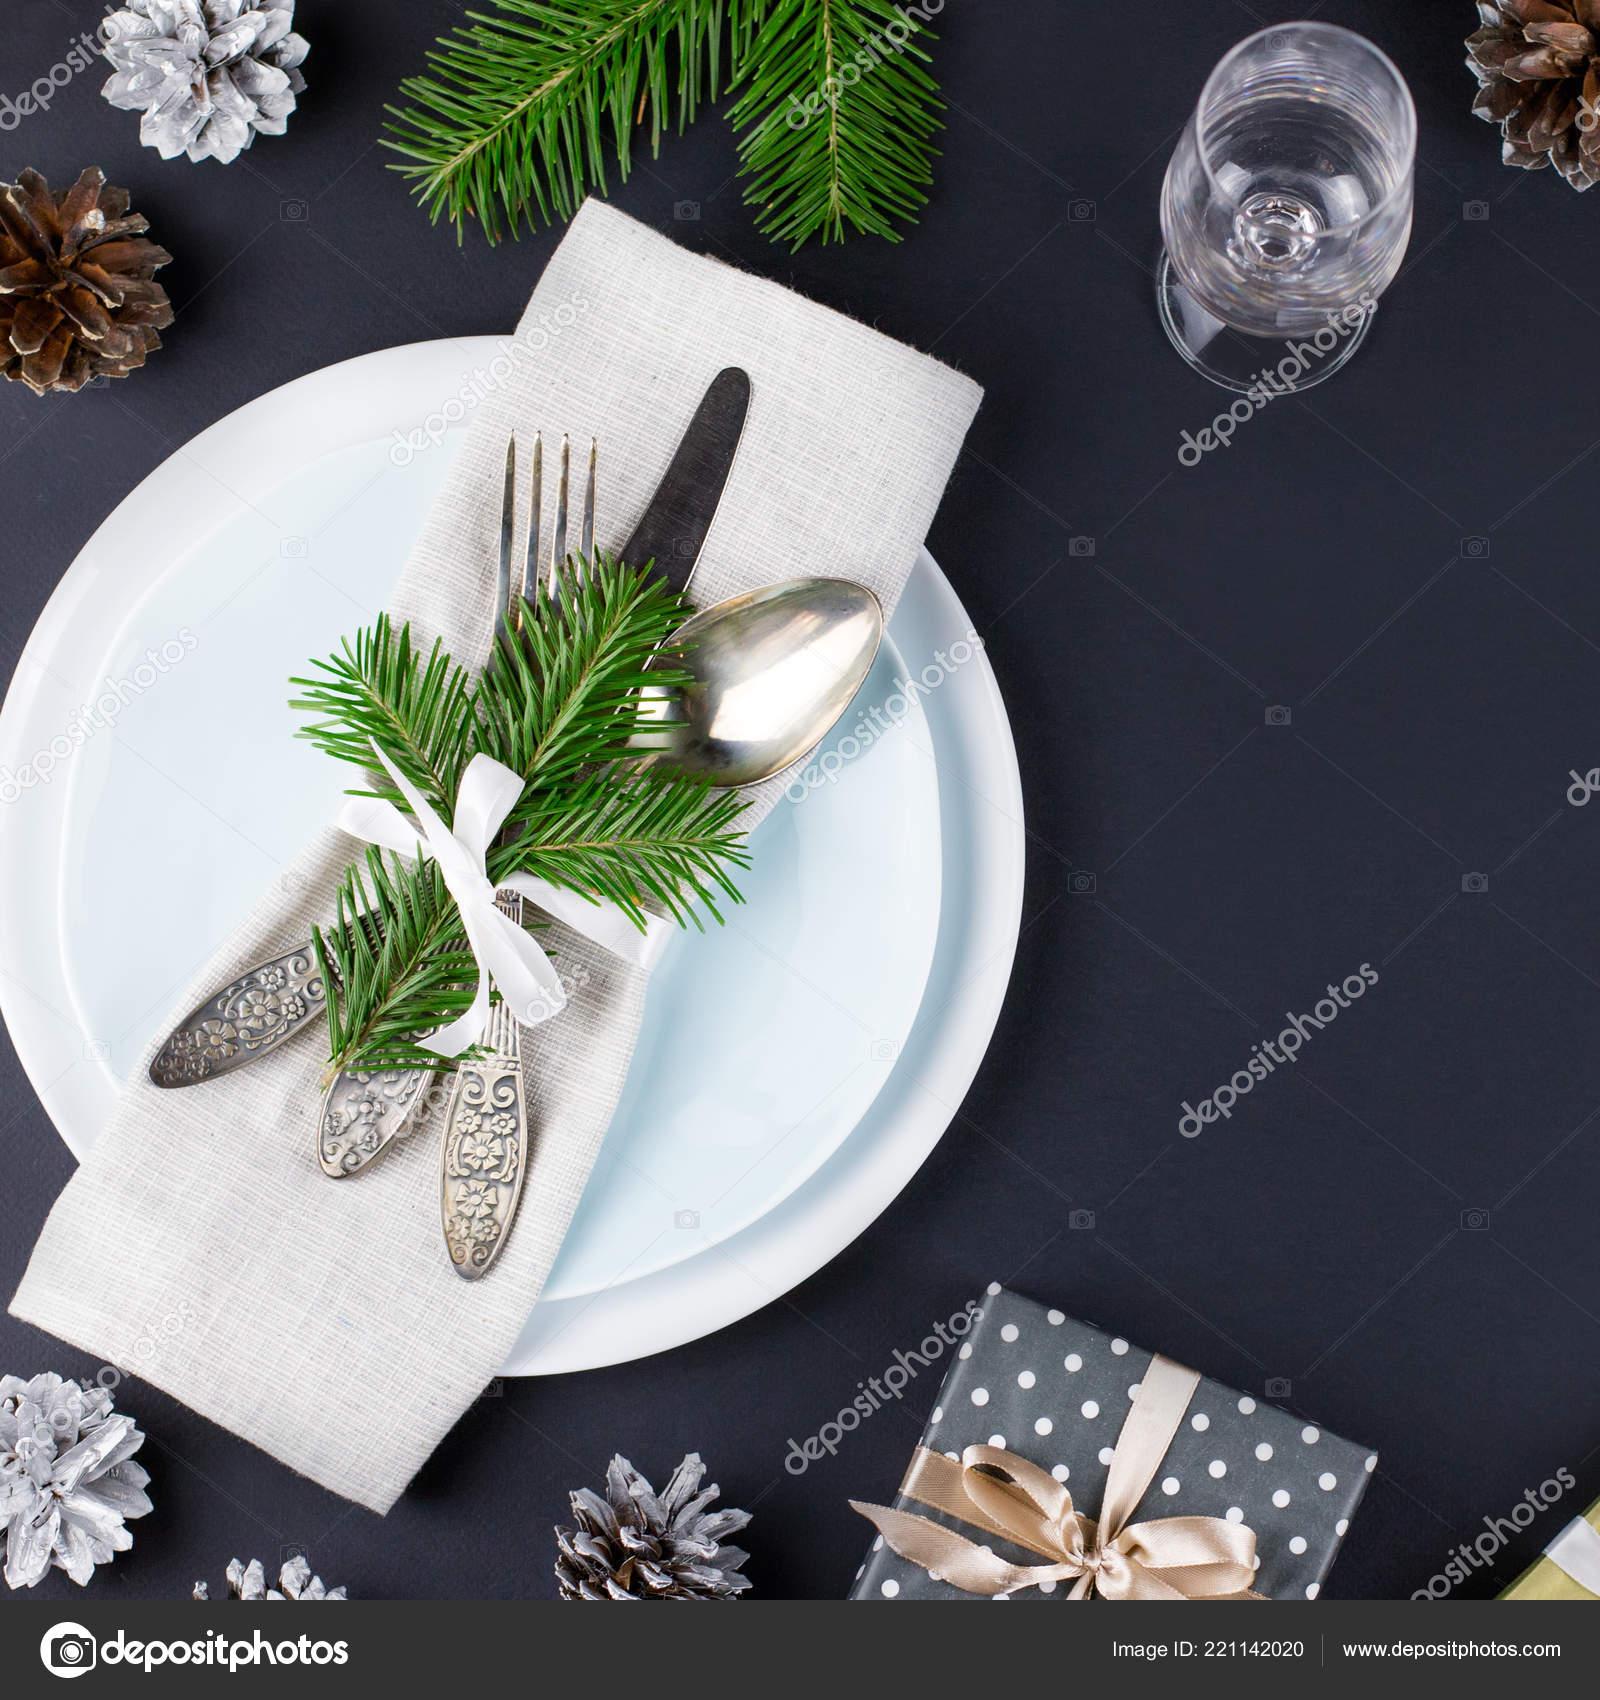 Christmas Table Setting Plates Silverware Gift Box Decorations Black Gold– stock image